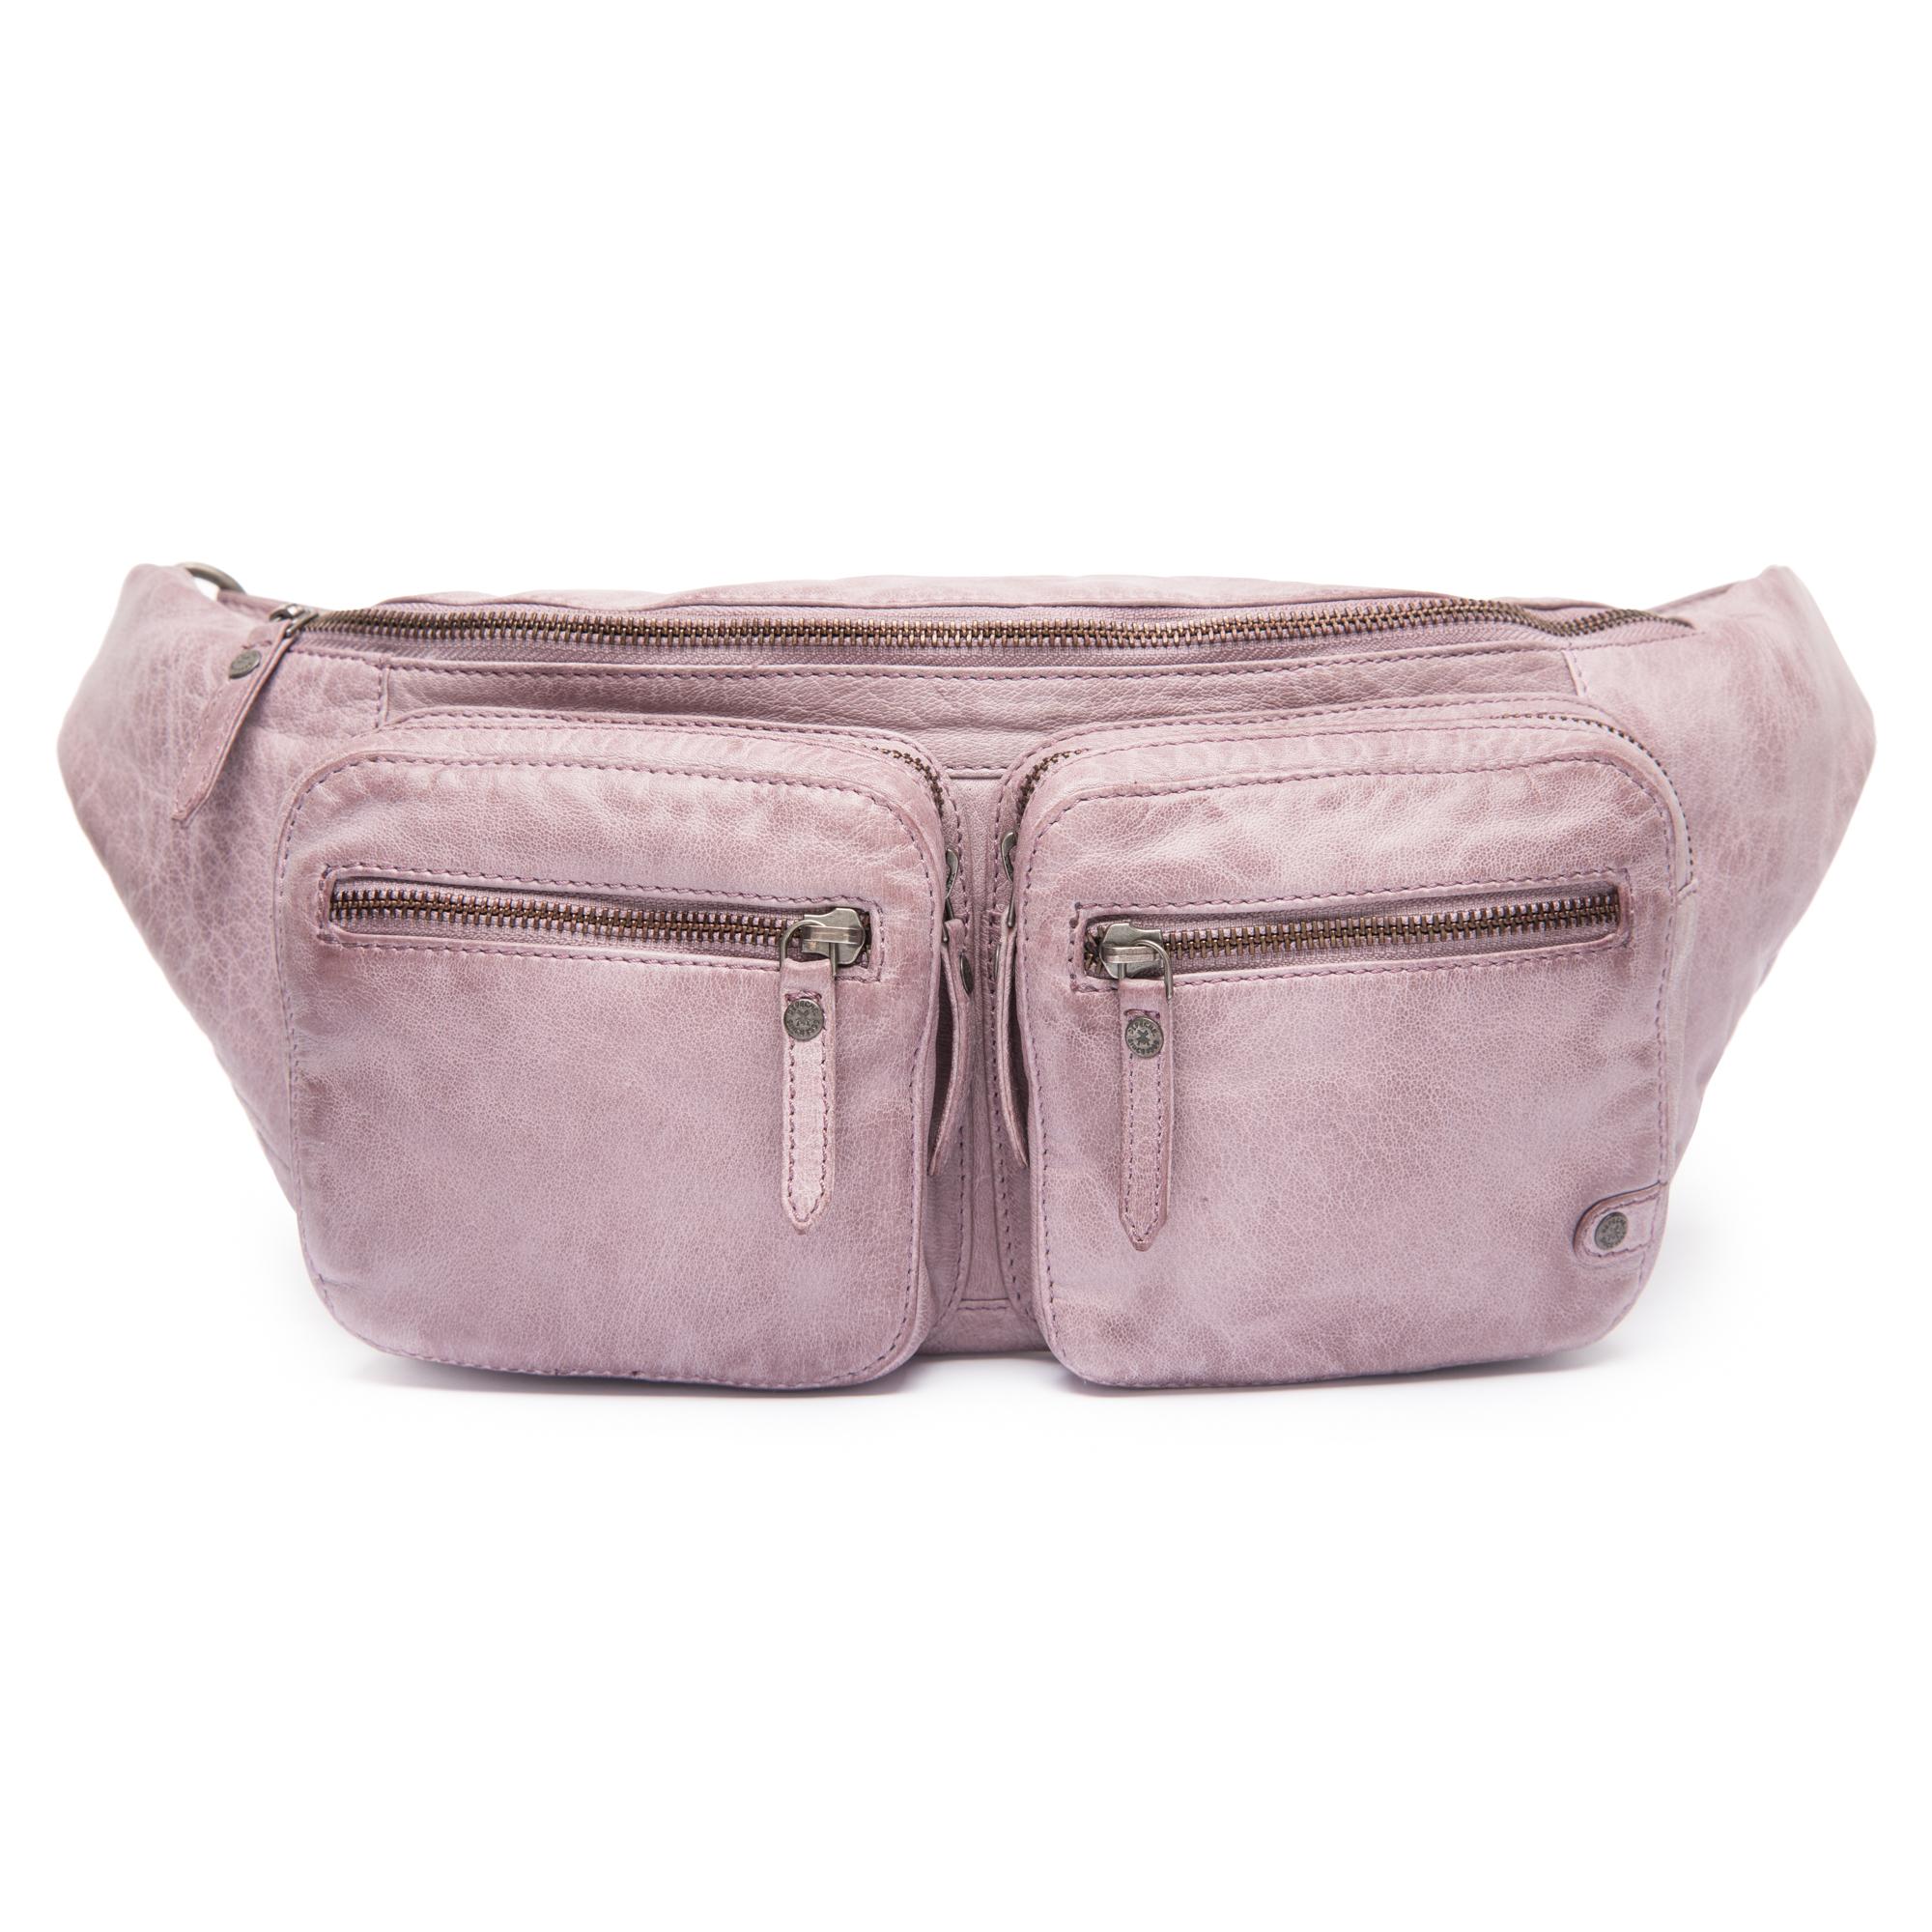 Depeche bæltetaske, lavender